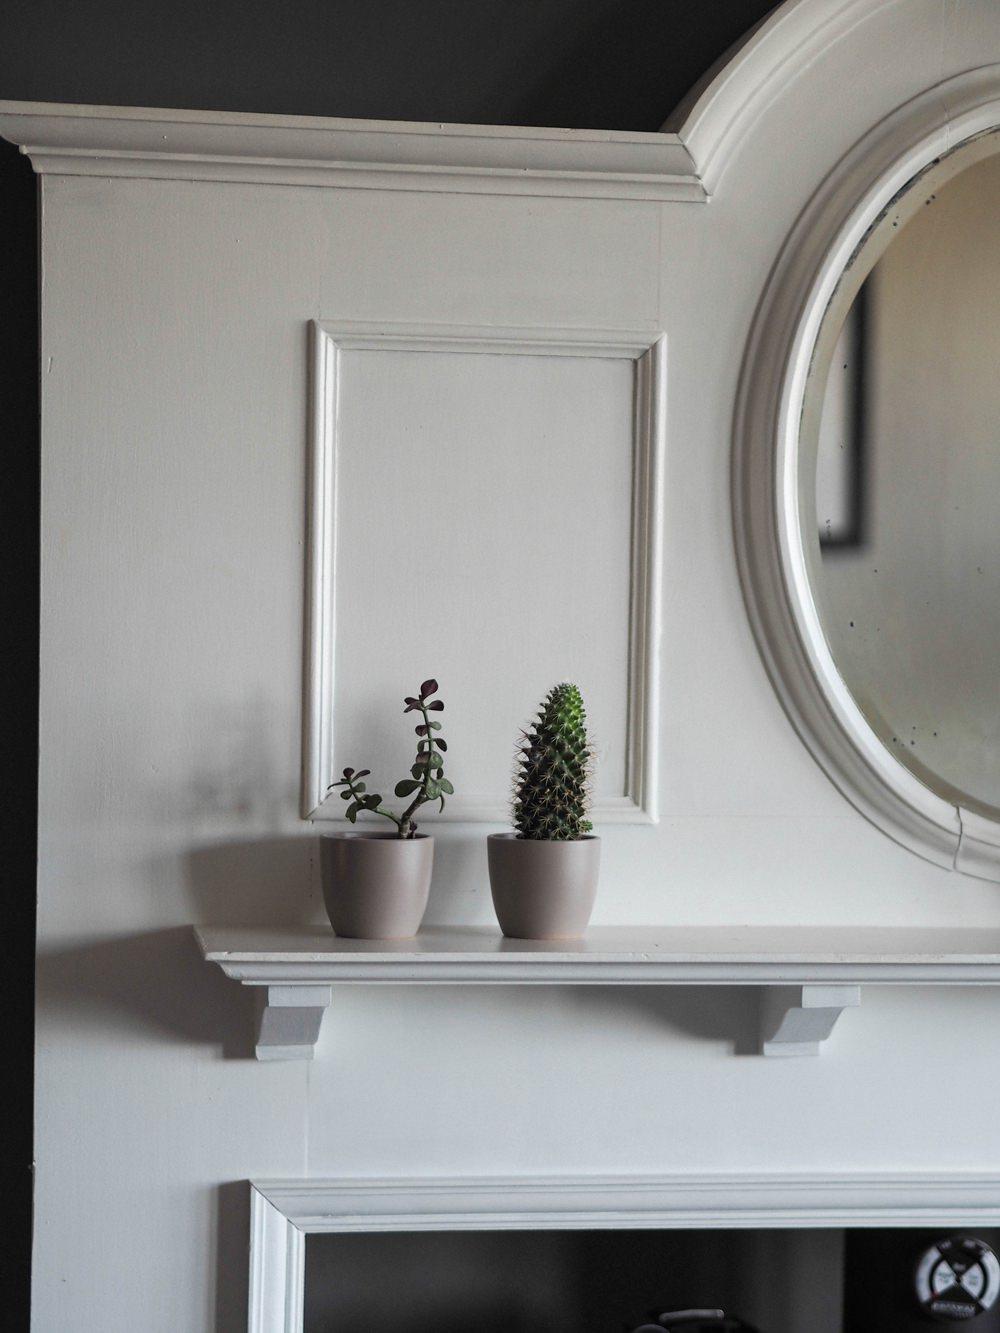 1930s House Living Room Renovation Art Deco Fireplace Mantle Mirror Oval White Log Burner Farrow & Ball Mole's Breath Succulents